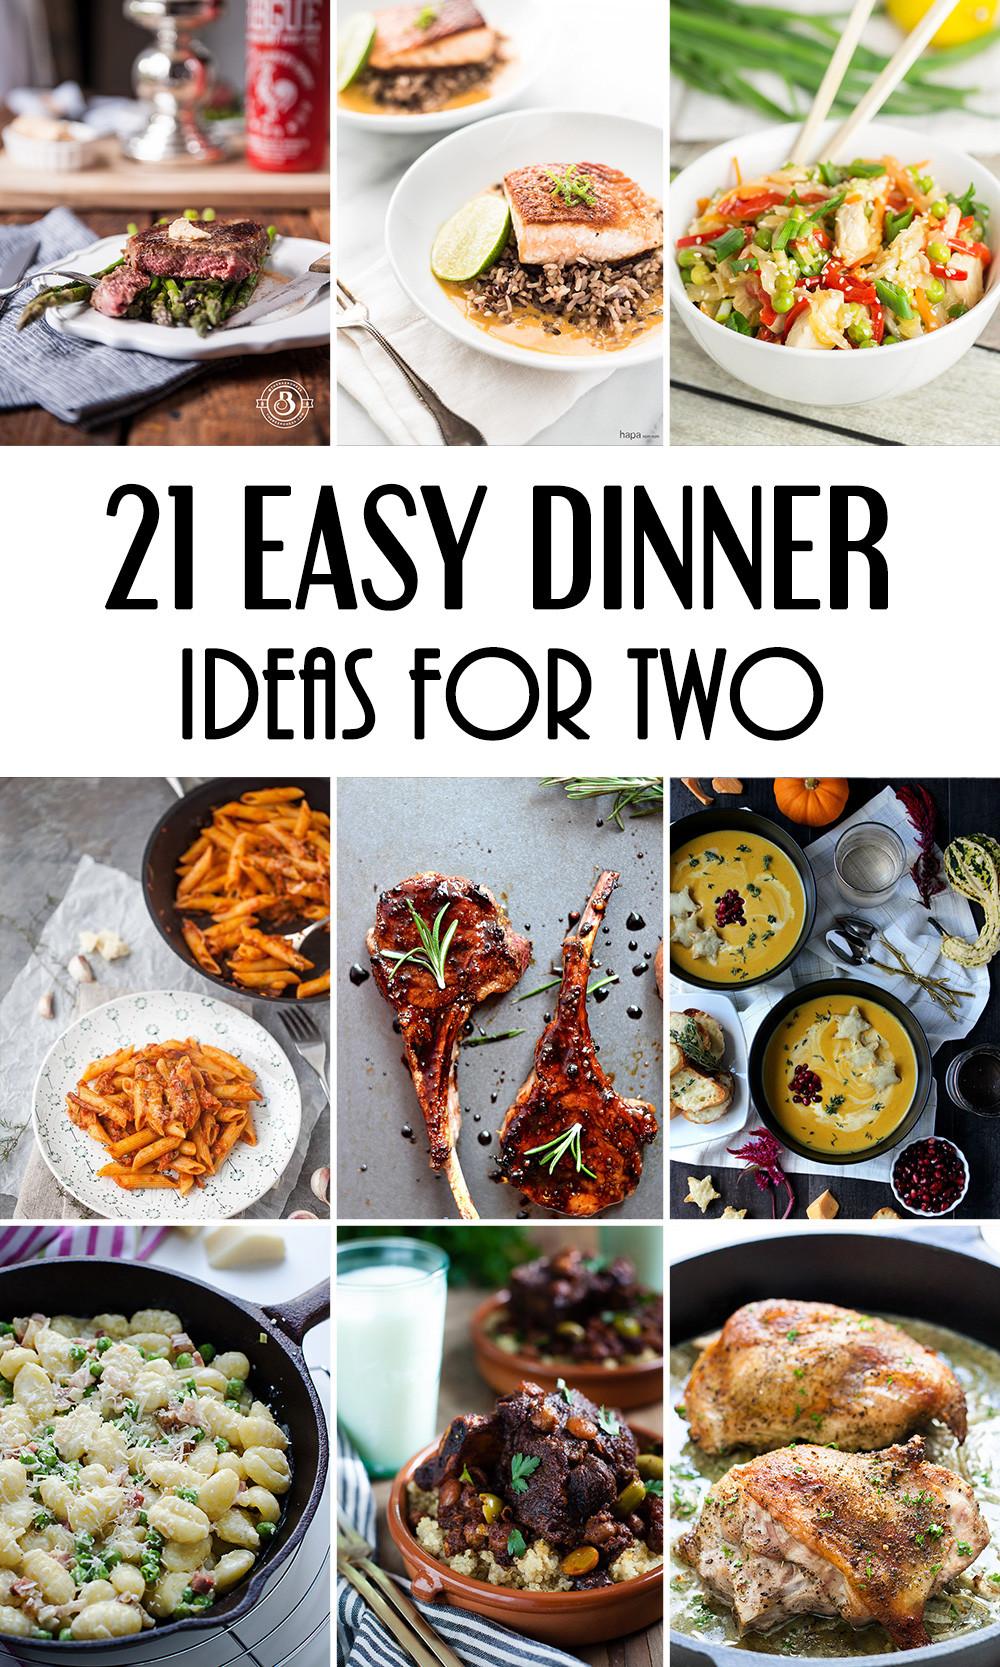 Dinner Ideas Easy  21 Easy Dinner Ideas For Two That Will Impress Your Loved e